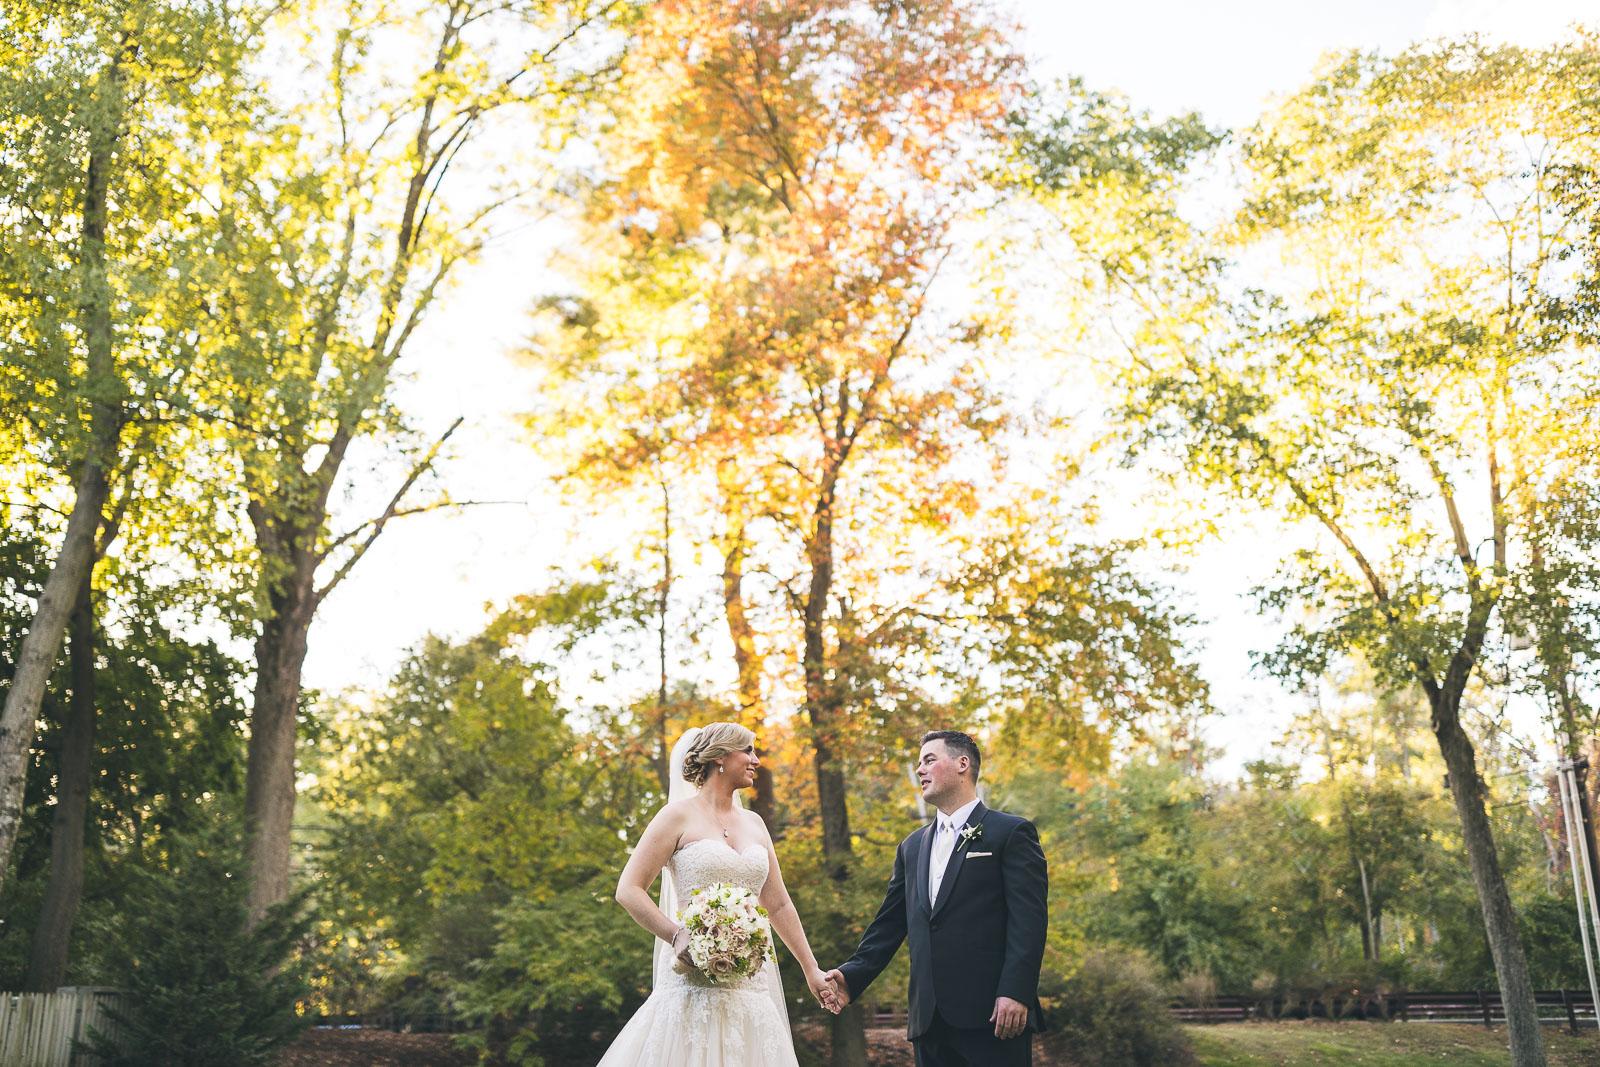 Autumn Wedding at The Grain House